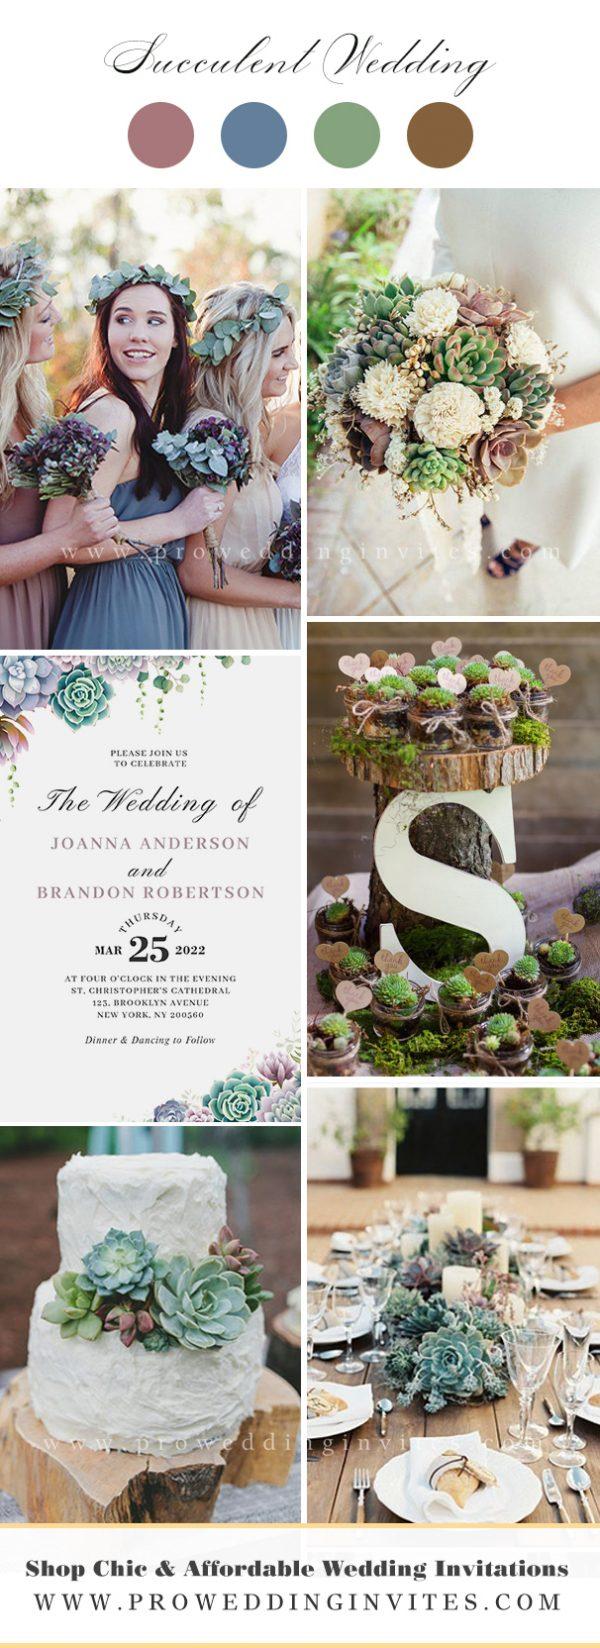 Mauve Succulent Wedding Ideas Wedding Wedding Color Ideas with Matching Invitations